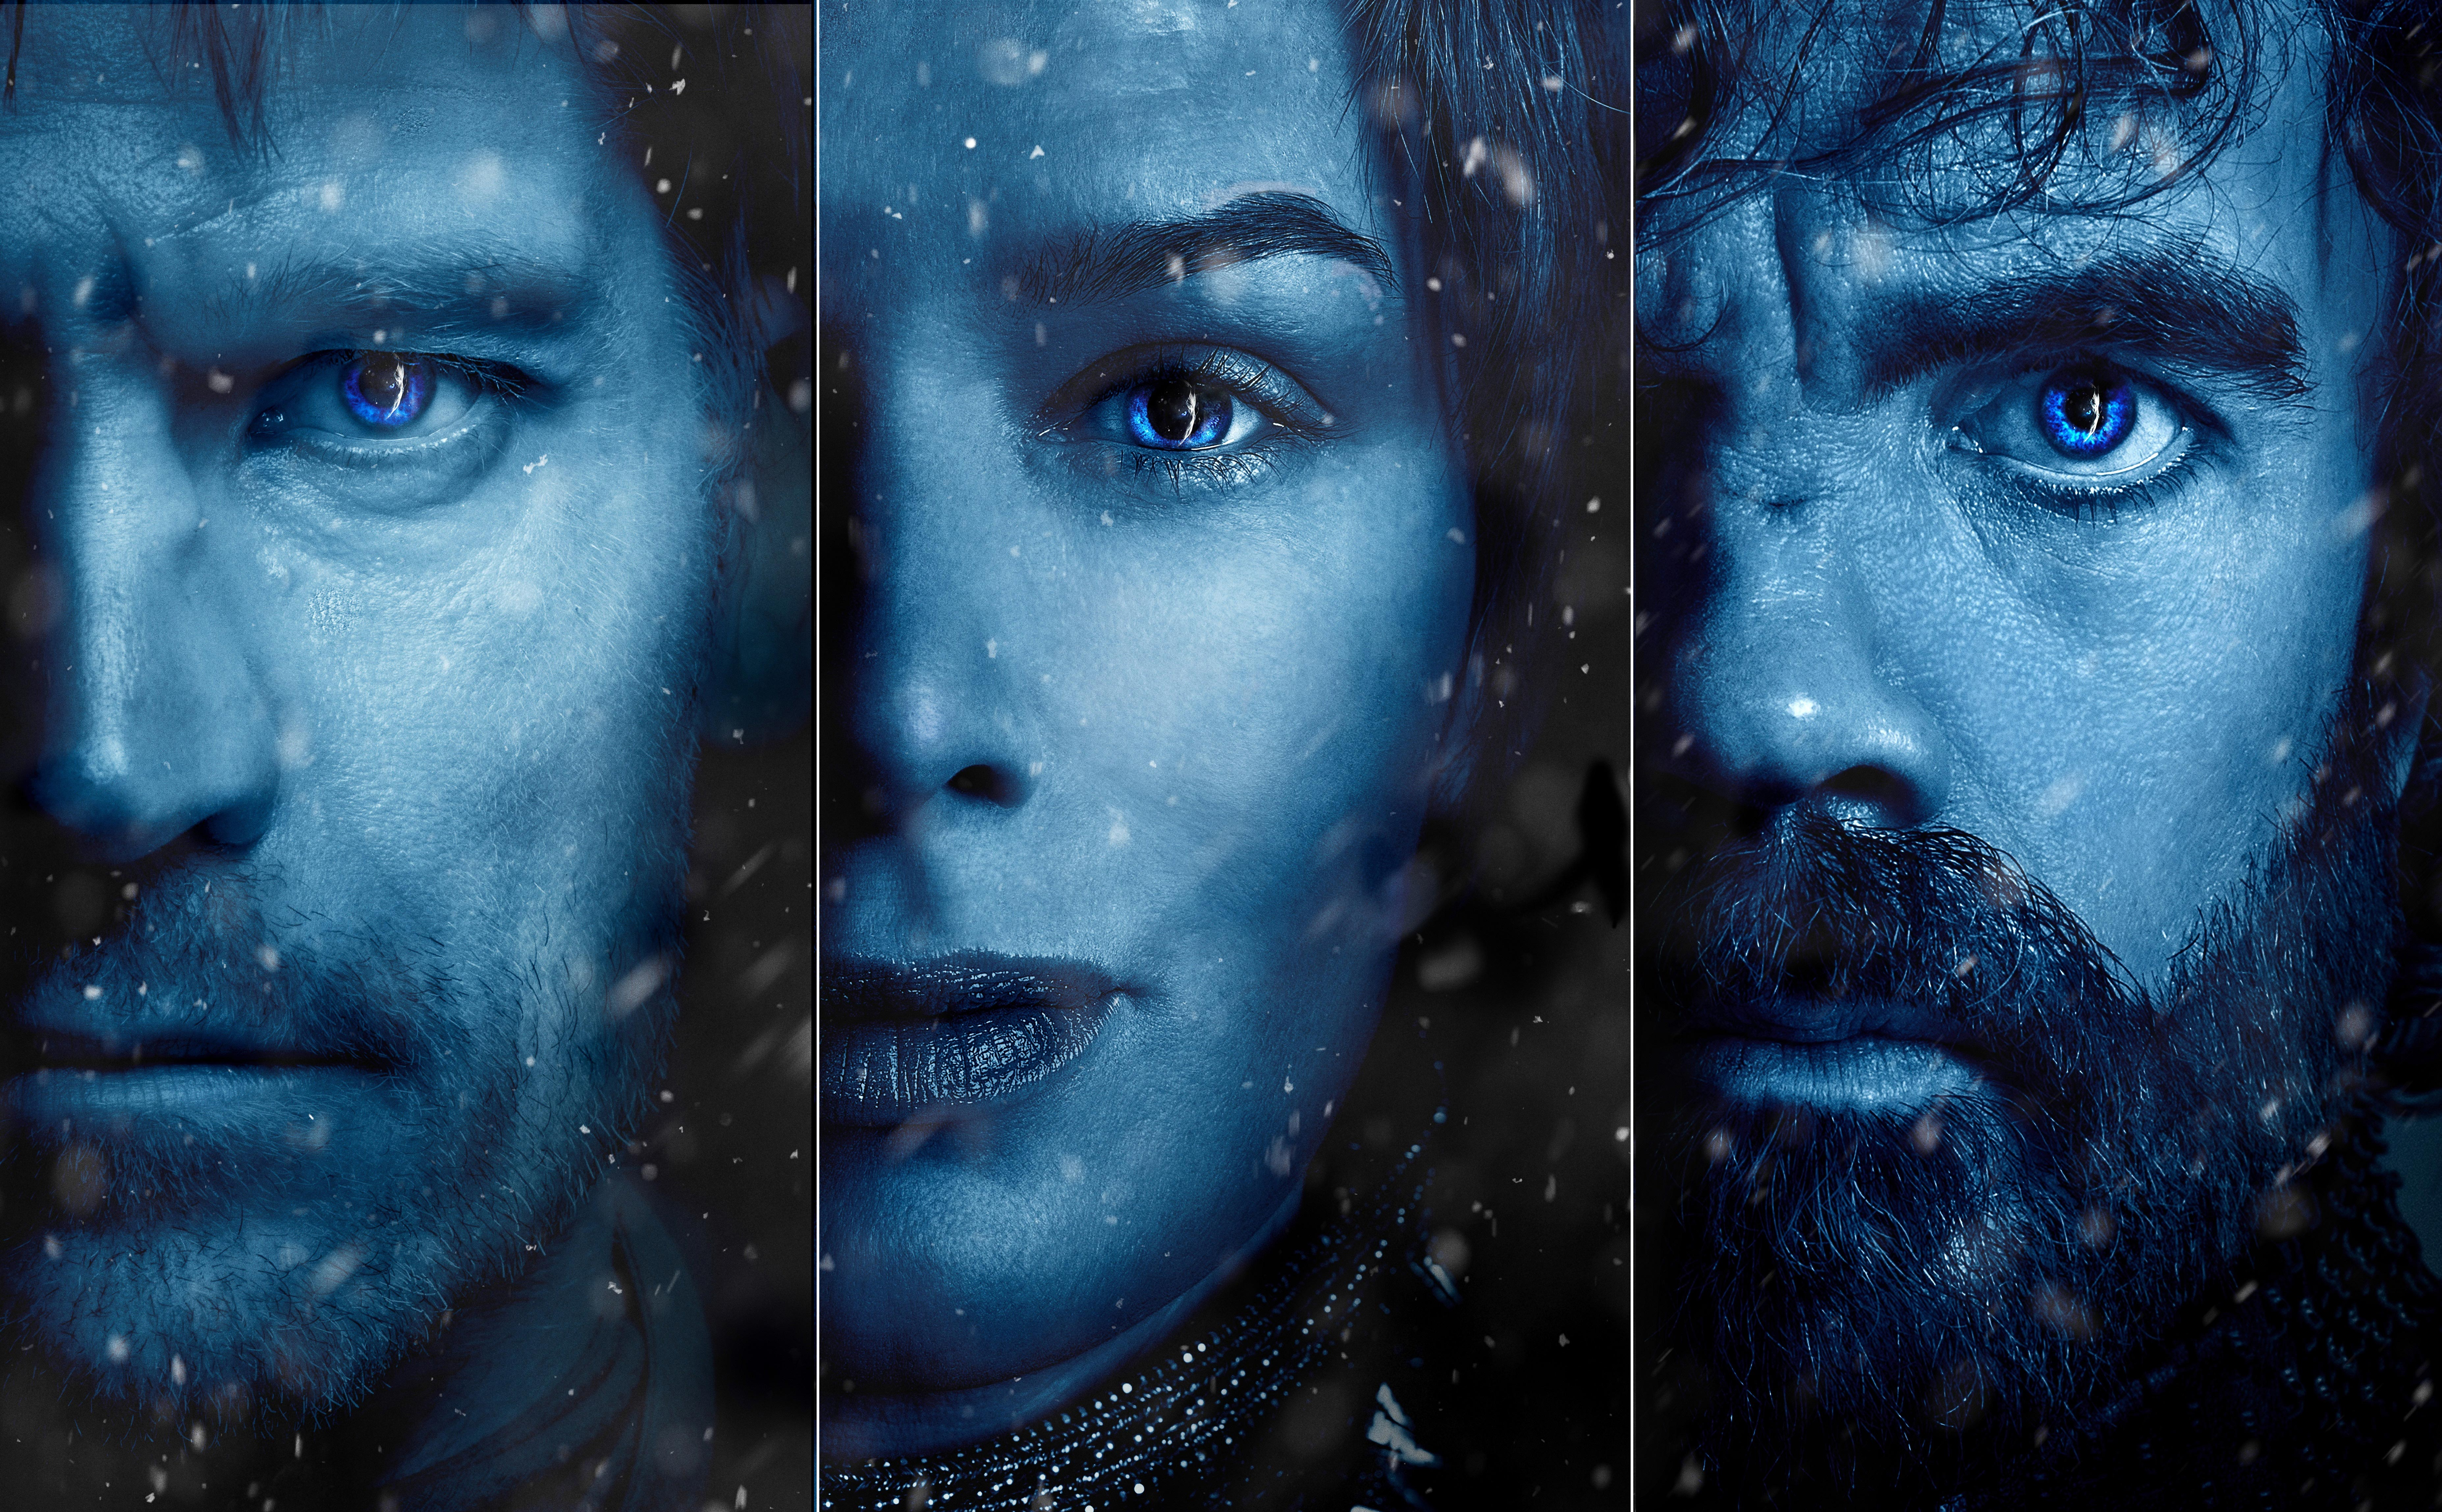 Tyrion Lannister Jaime Lannister Cersei Lannister Posters ...